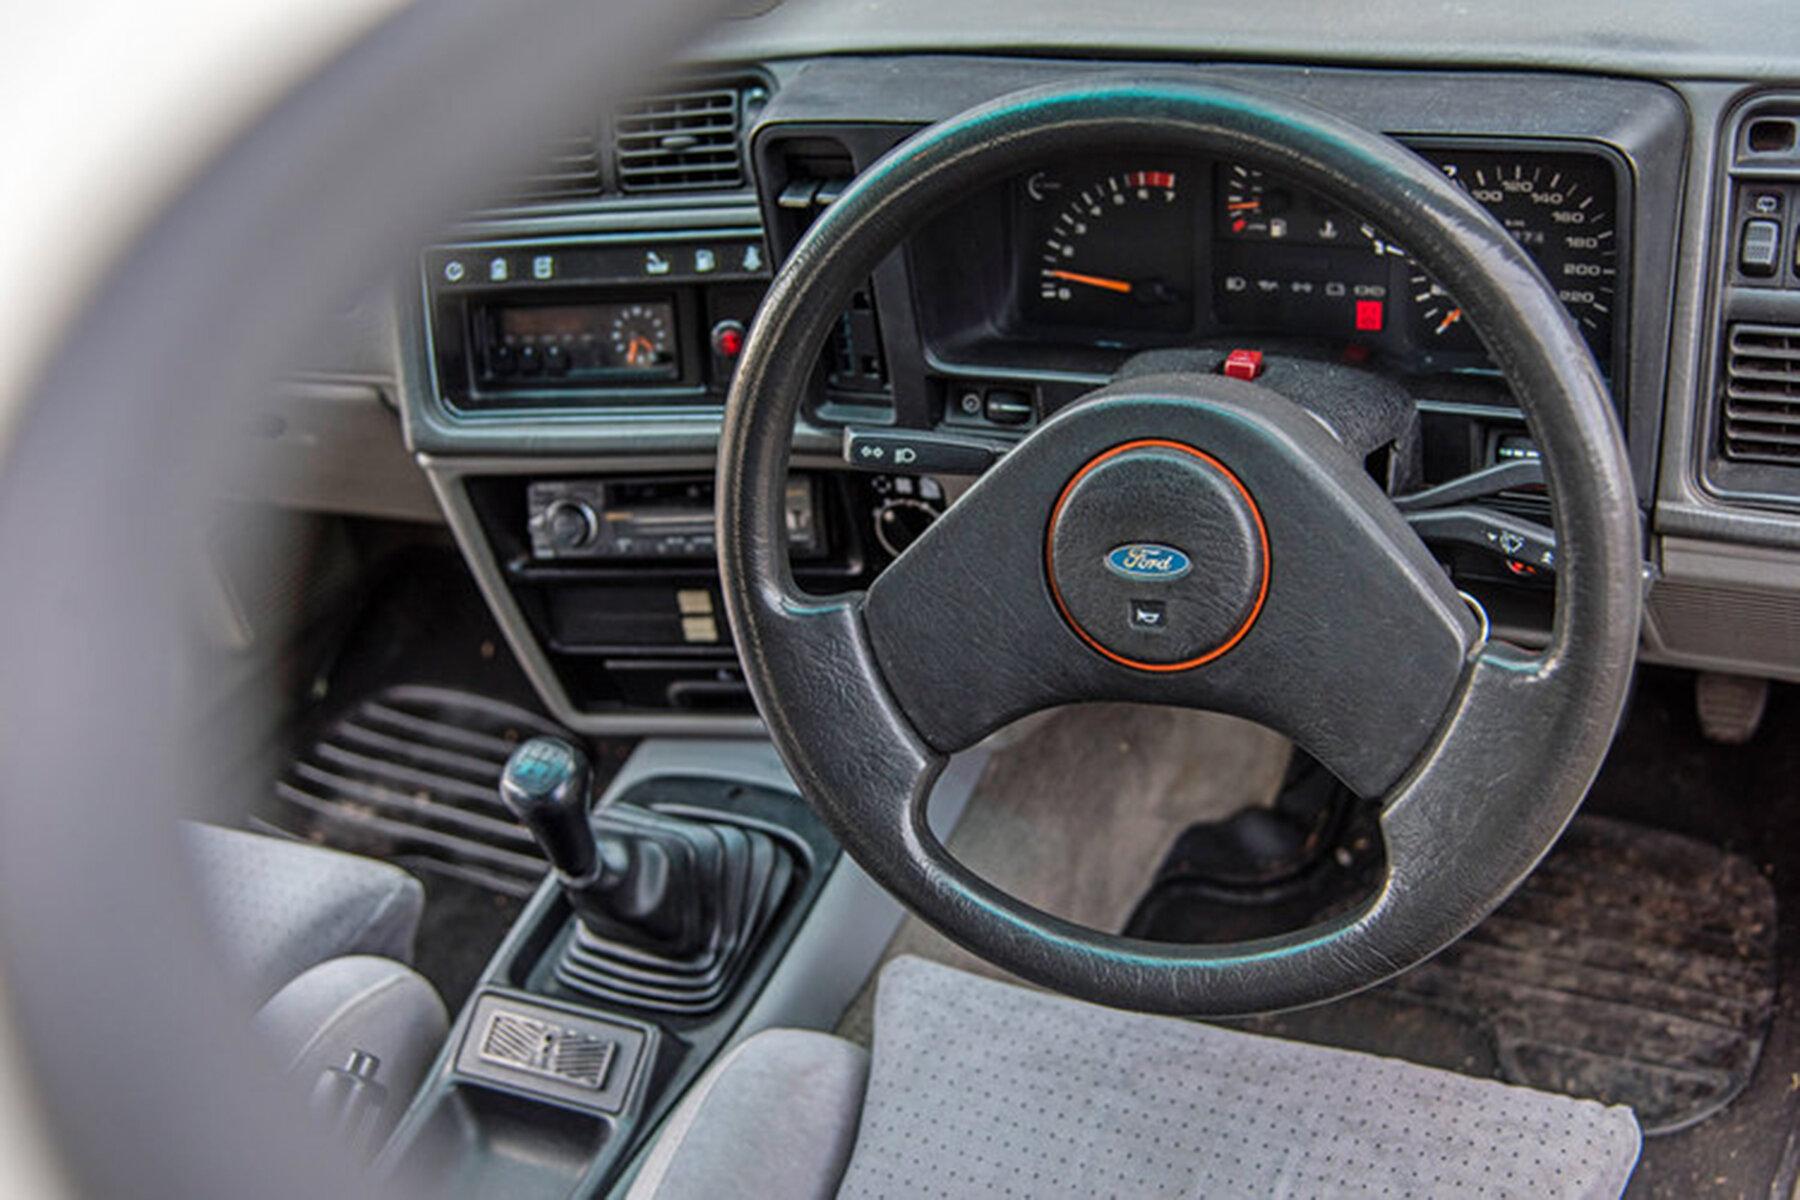 Ford Sierra XR8 gets standard issue interior